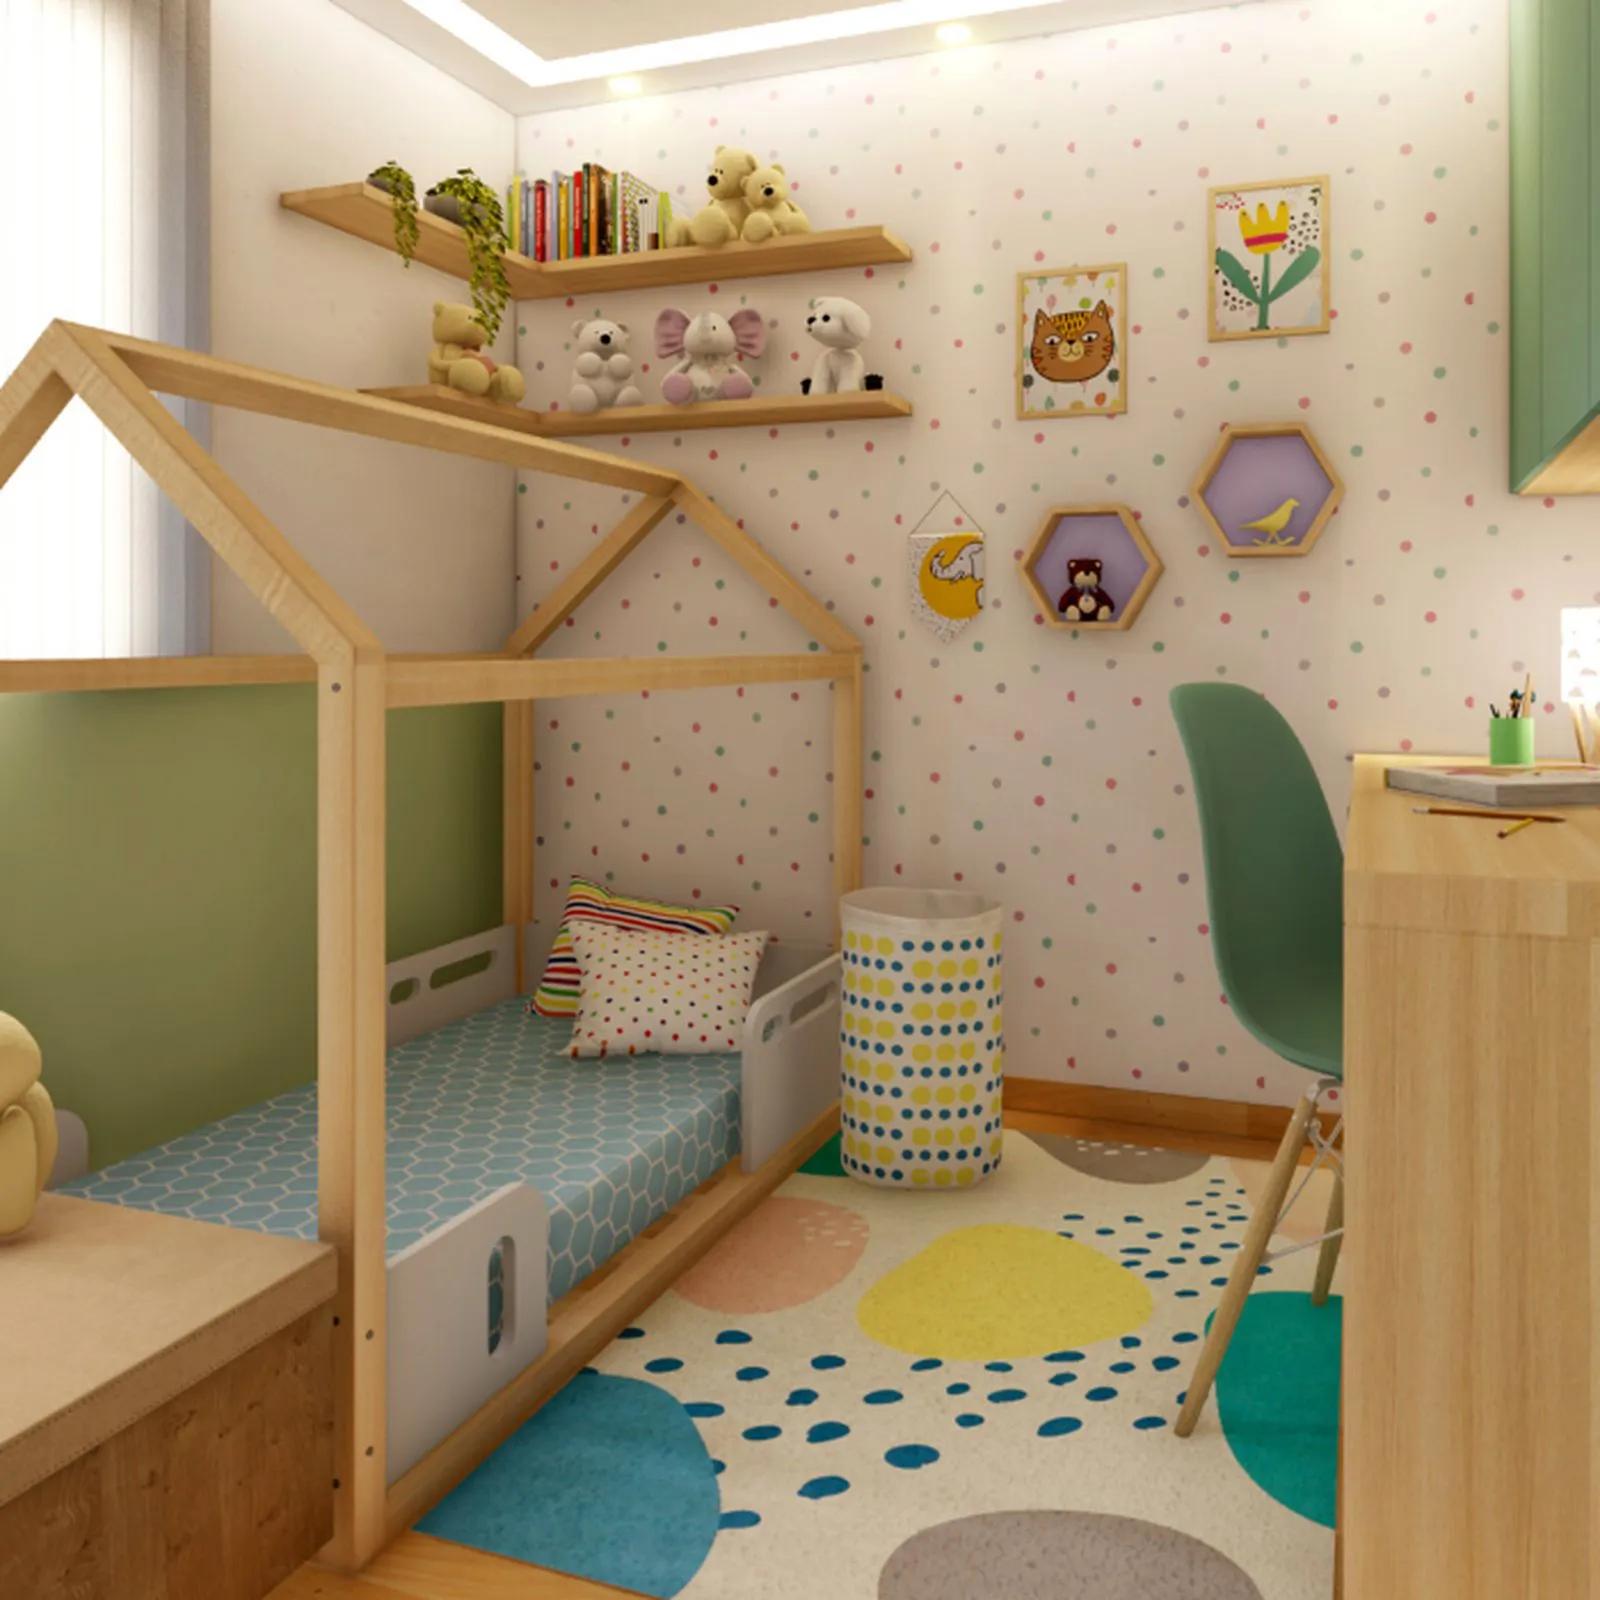 Tapete quarto infantil 100 x 150 cm estampa Mergulho